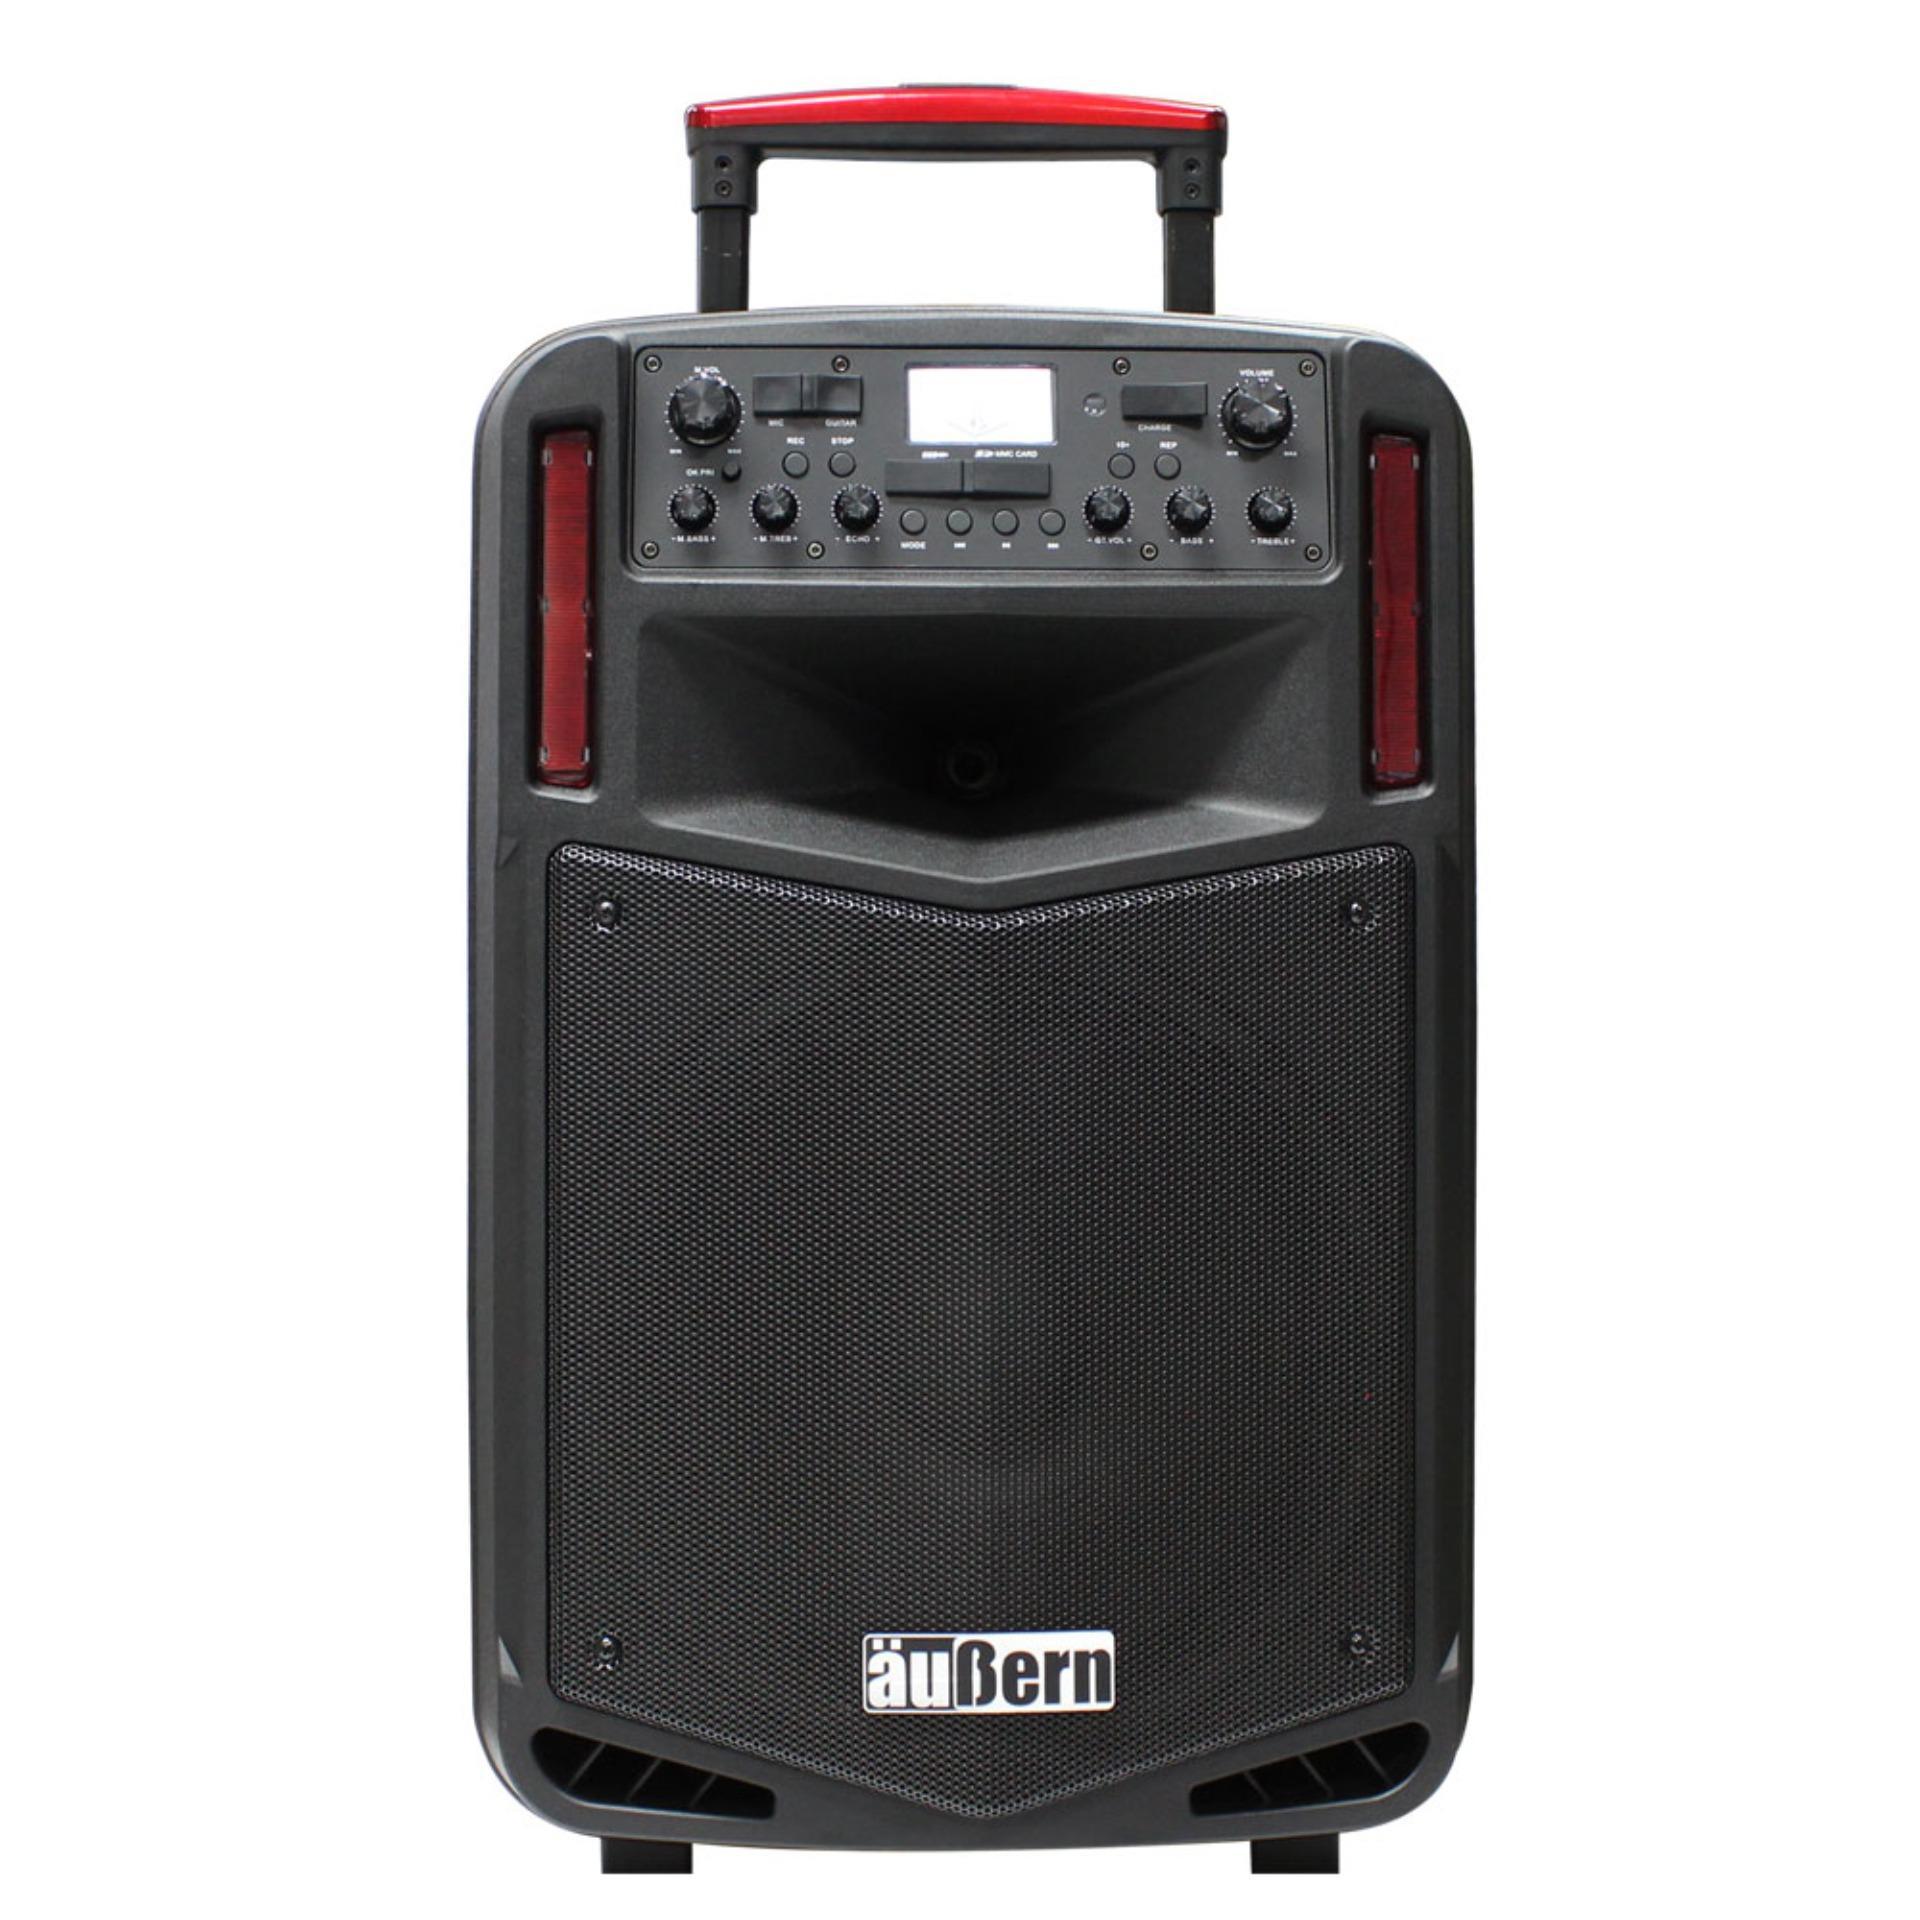 Jual Speaker Sistem Pa Terlengkap 200 Watt Power Amplifier For Car By 2sc2922 2sa1216 Aubern Be 15cx Portable Audio System With 2 Wireless Mic